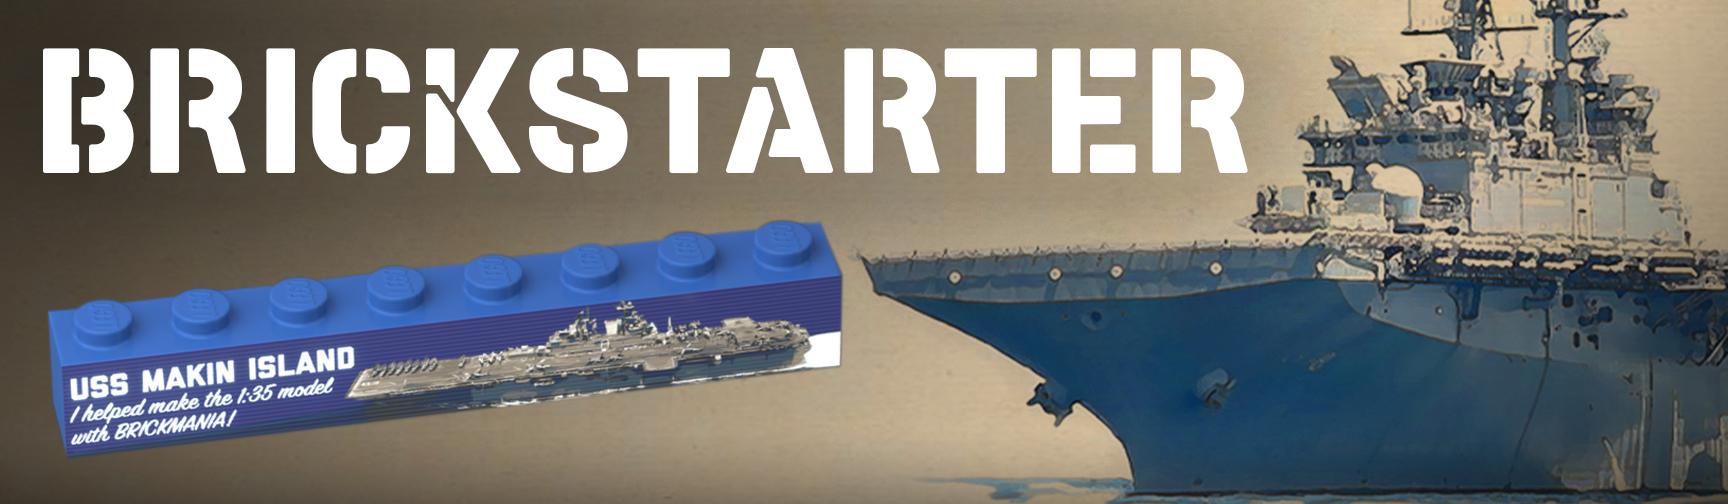 USS Makin Island BrickStarter